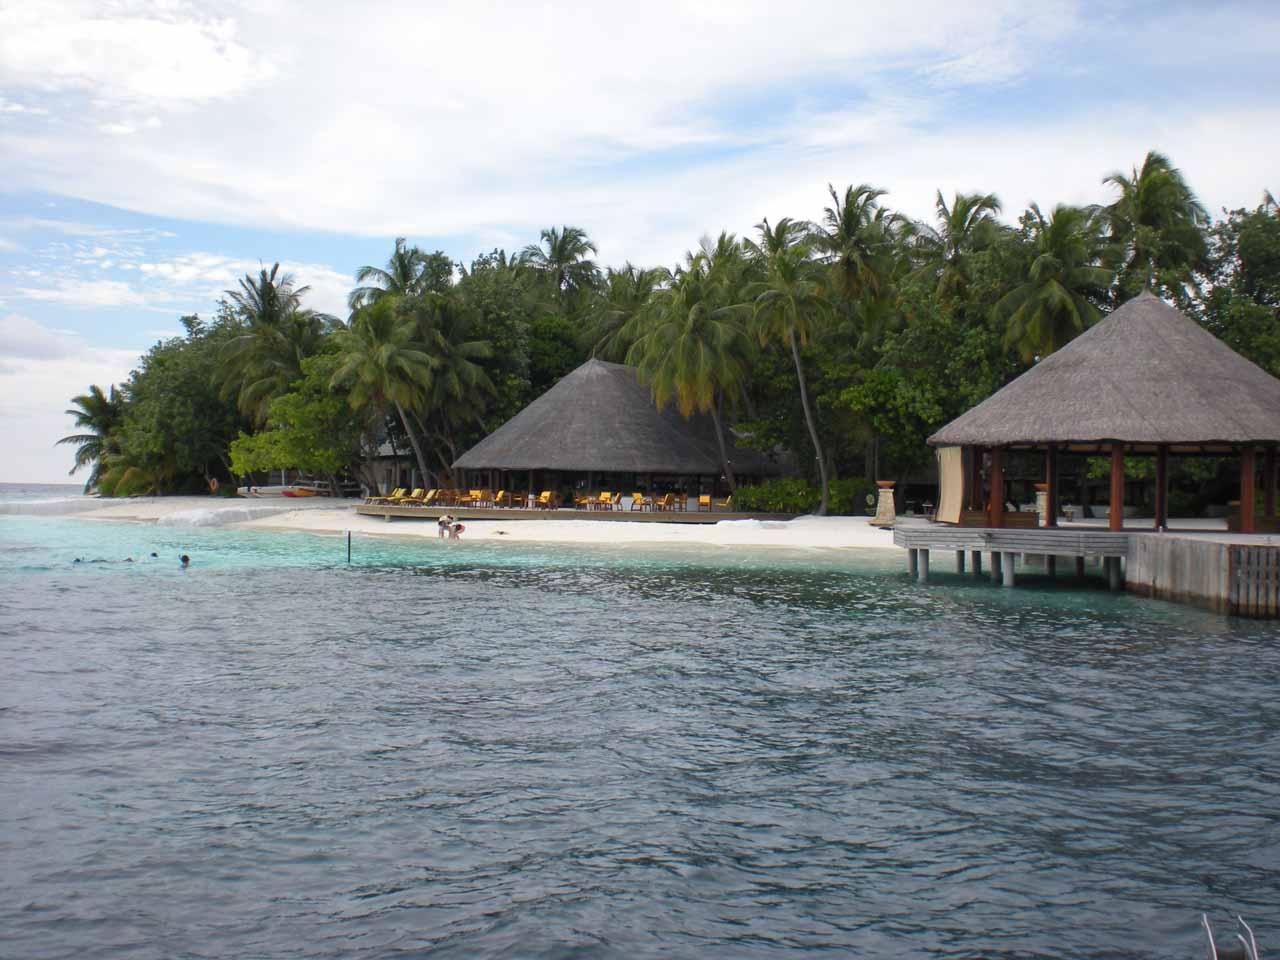 Approaching the Angsana Resort